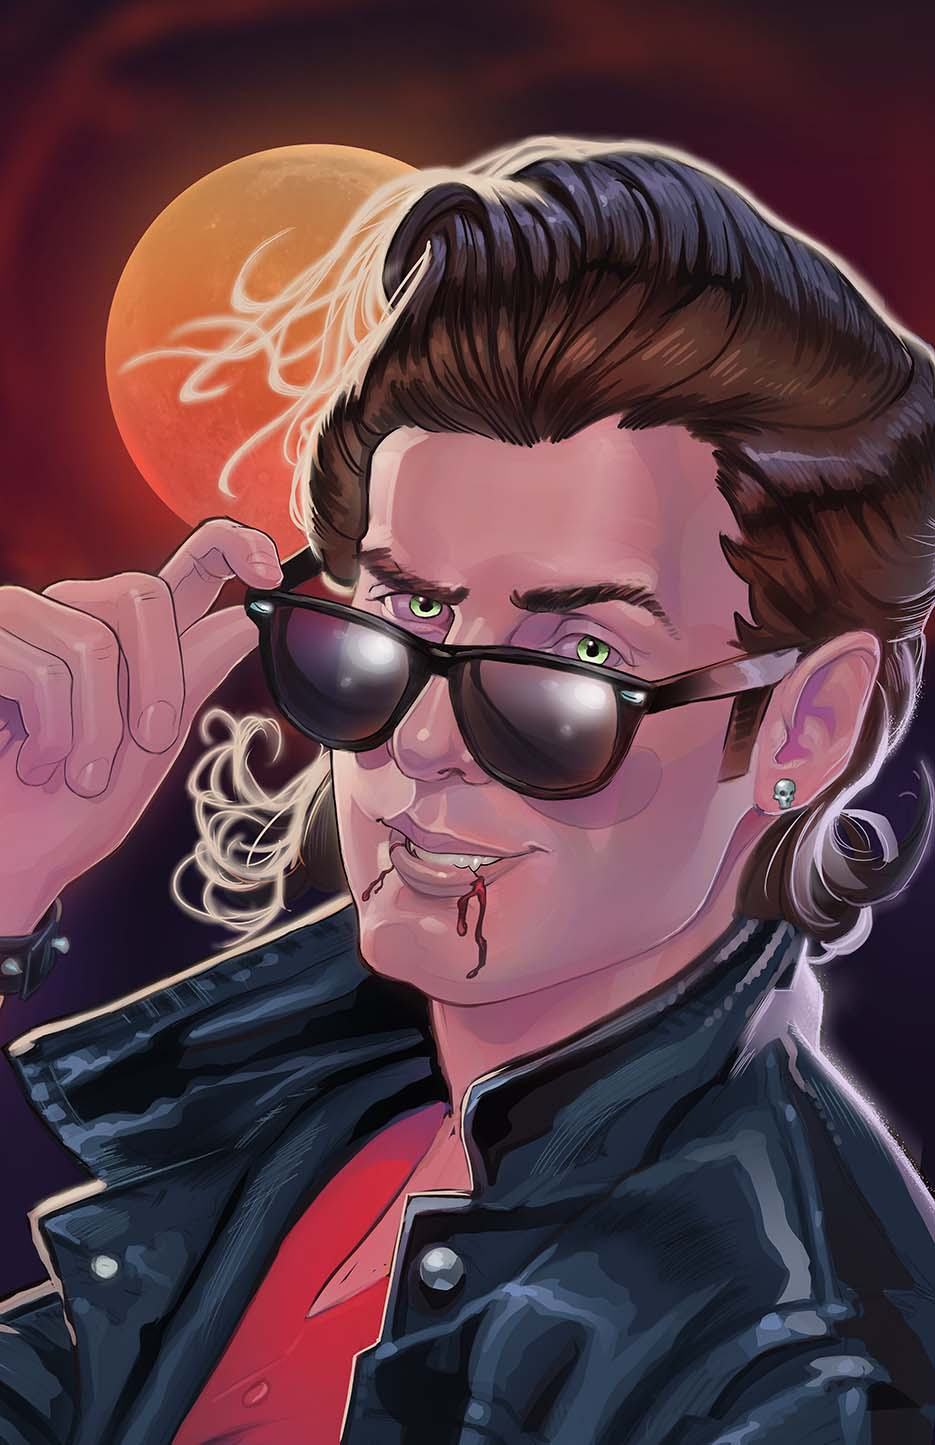 80s Dracula by amherman